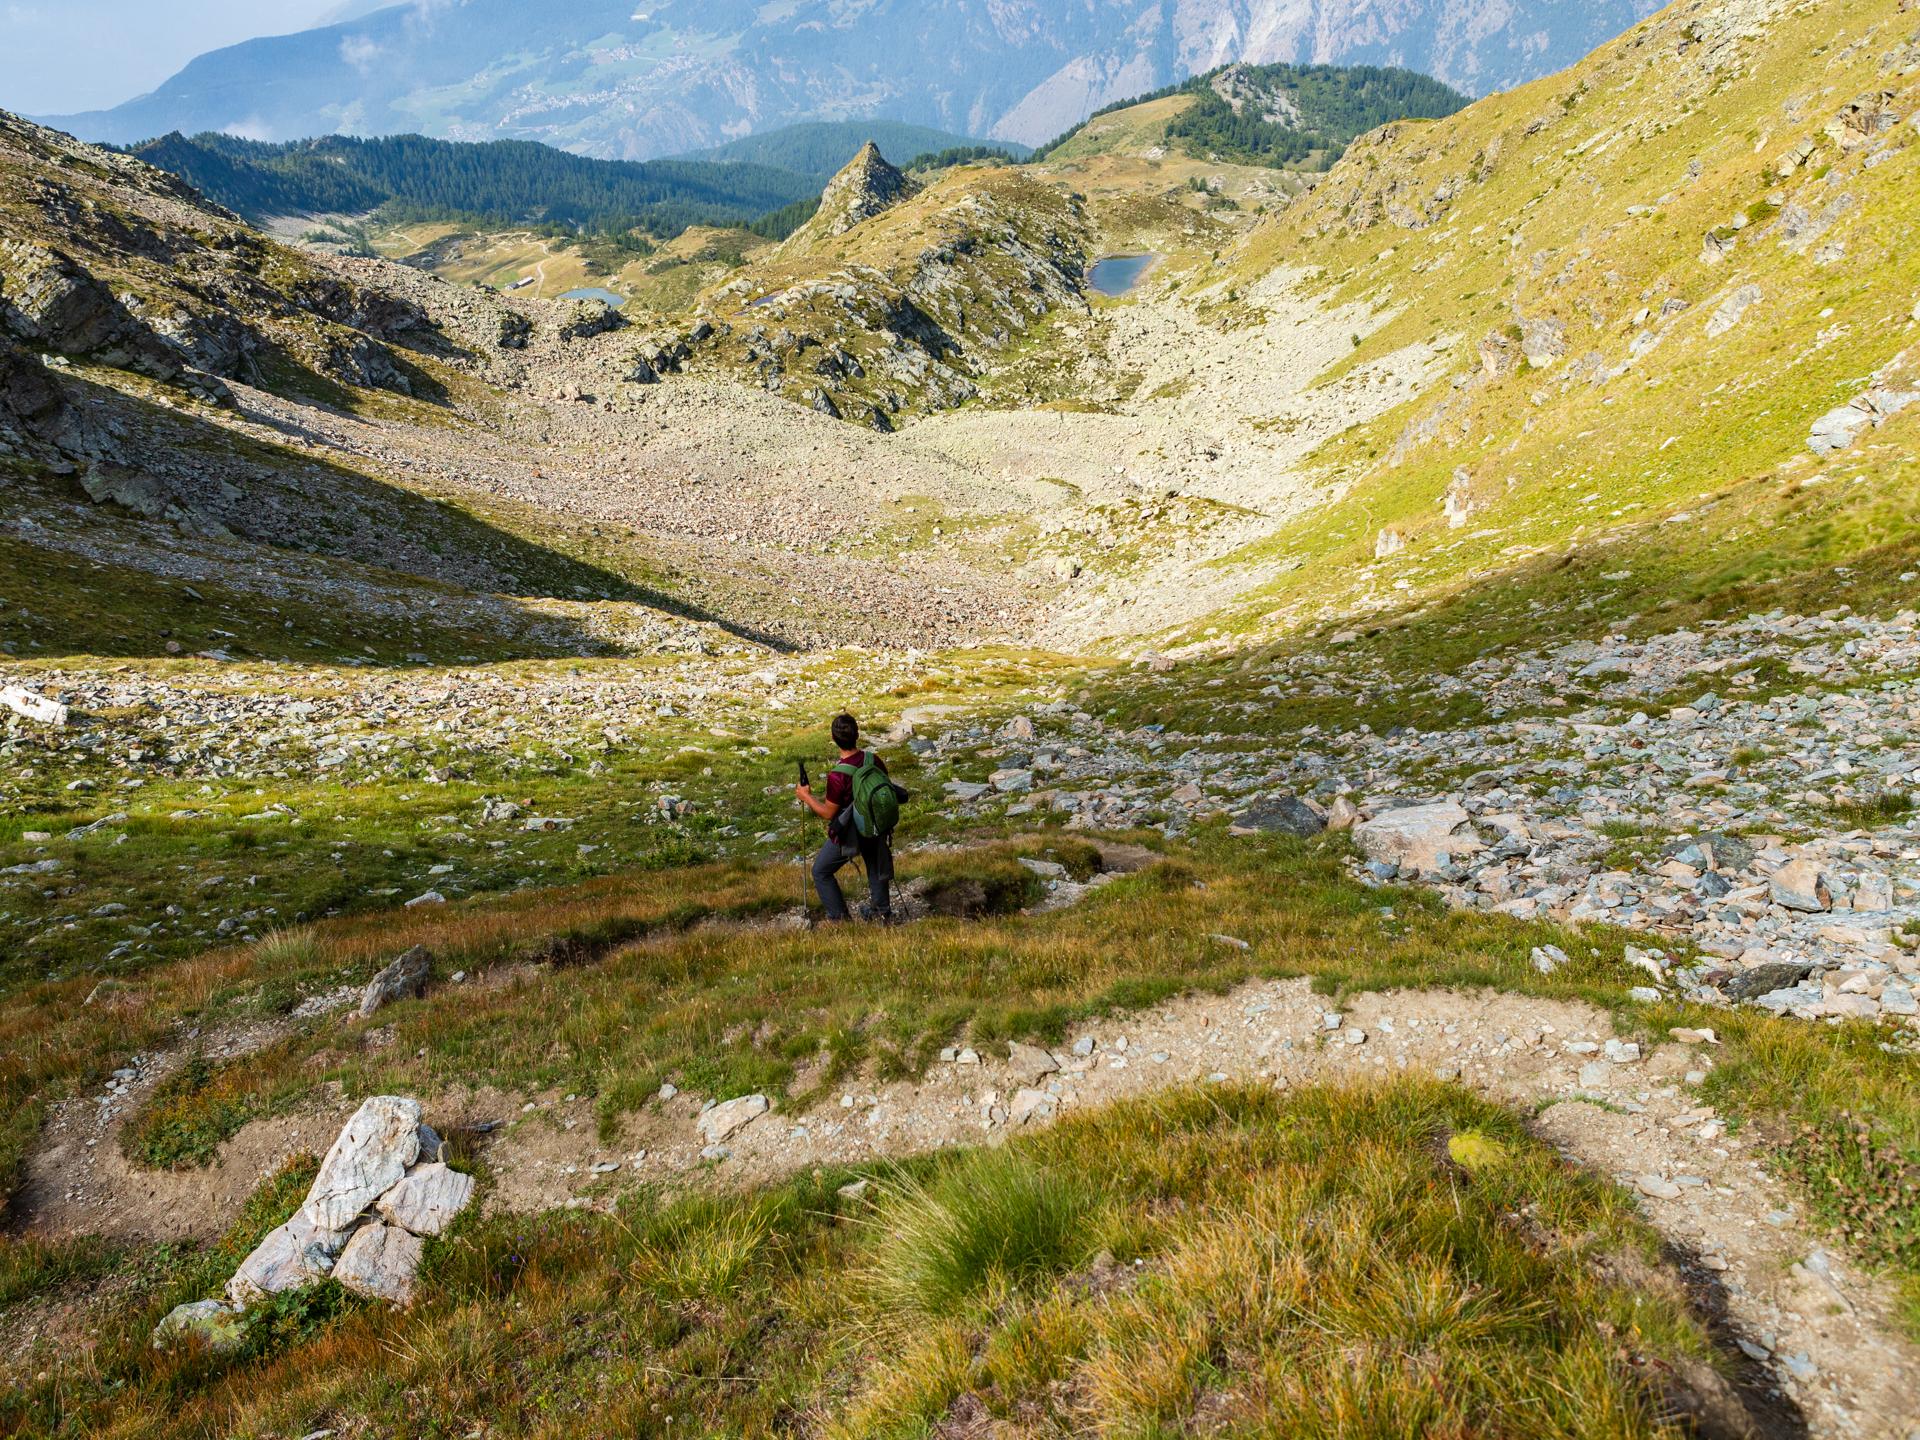 Piscina interna r t a au coeur des neiges valle d 39 aosta - Hotel courmayeur con piscina ...